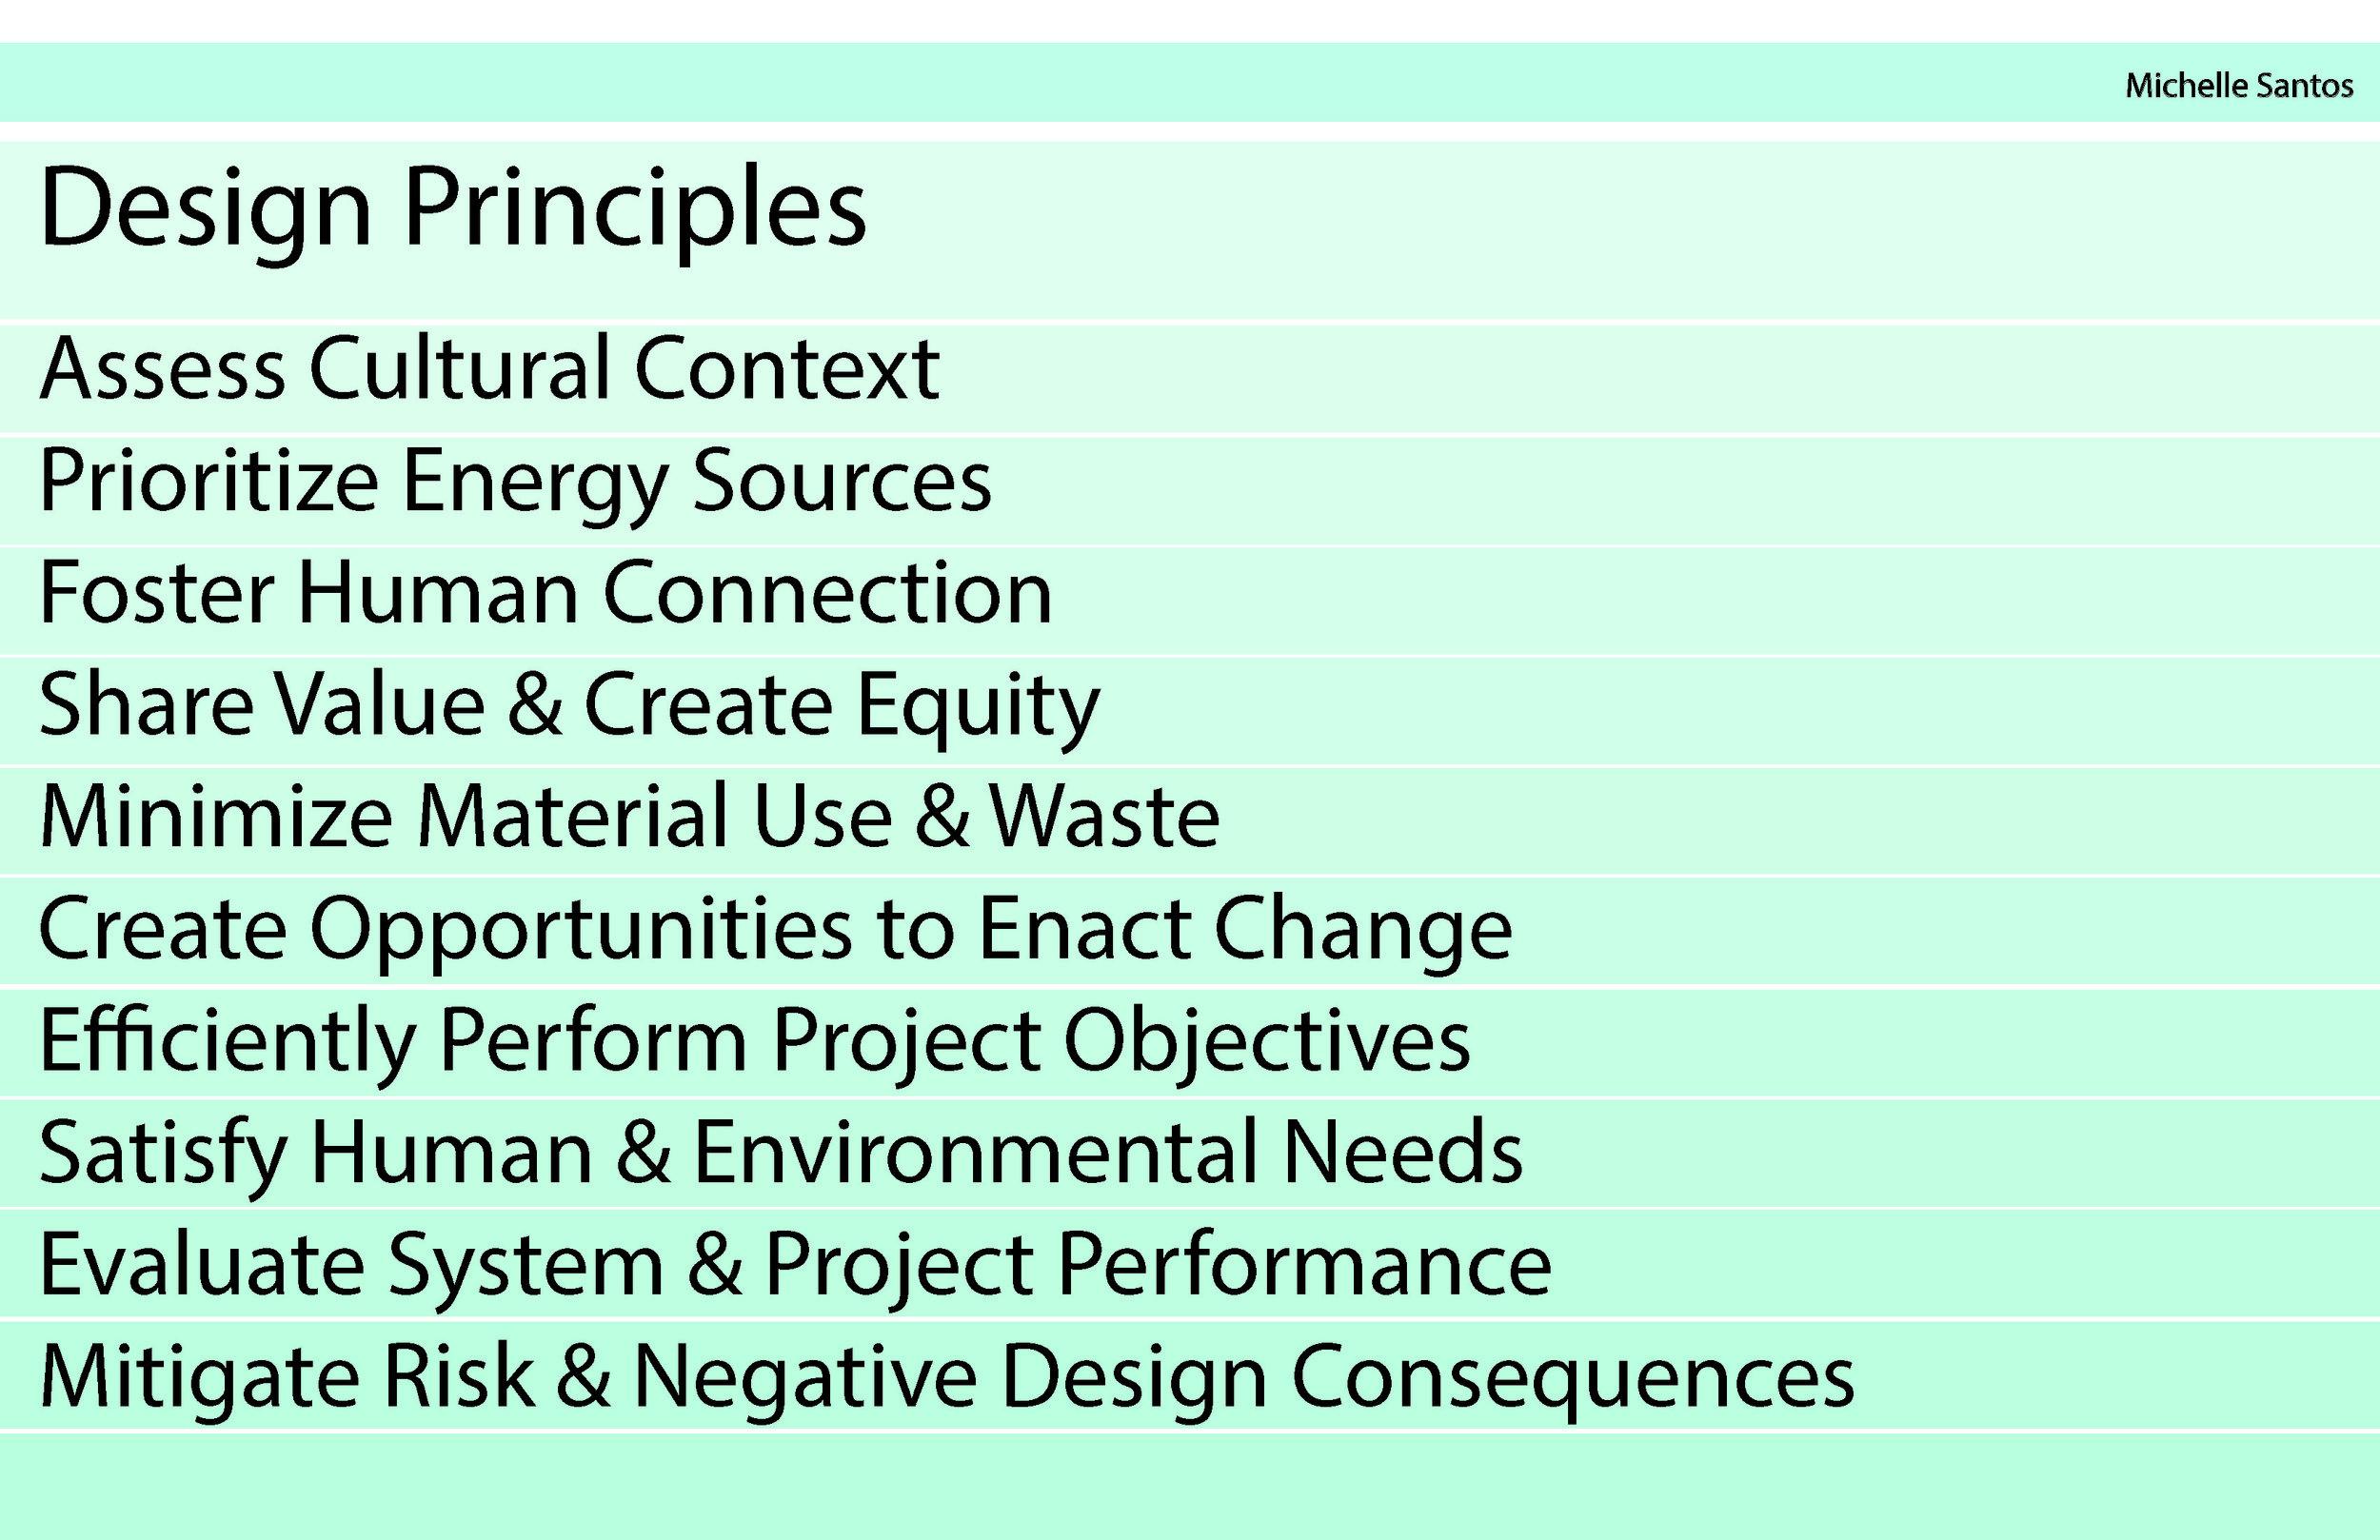 Personal Design Principles - Michelle Santos 2018